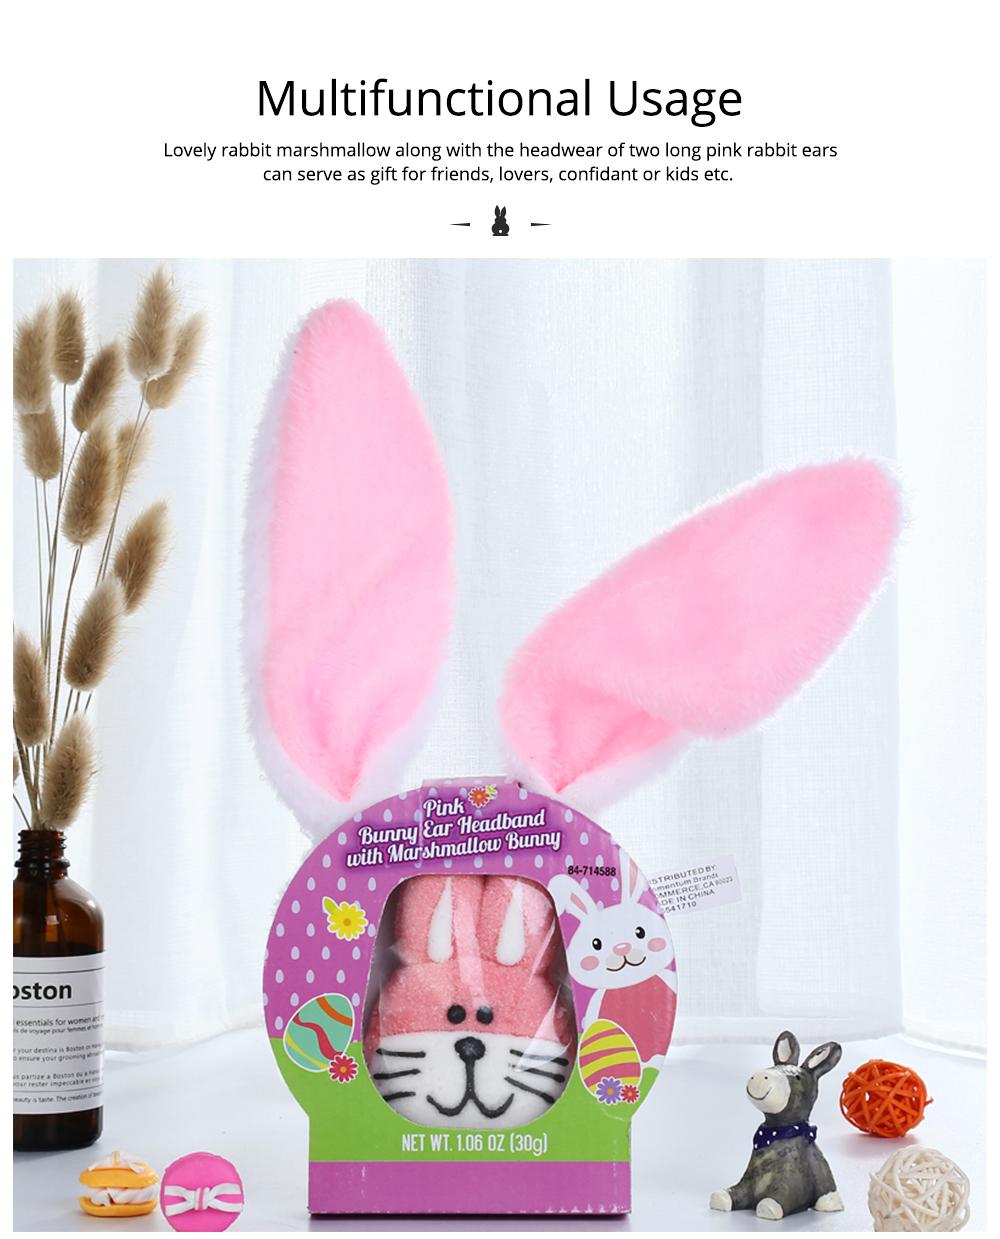 Rabbit Shape Marshmallow for Girlfriend as Birthday Gift, Creative Rabbit Cotton Candy A Pair as Present Rabbit Candy Floss 6